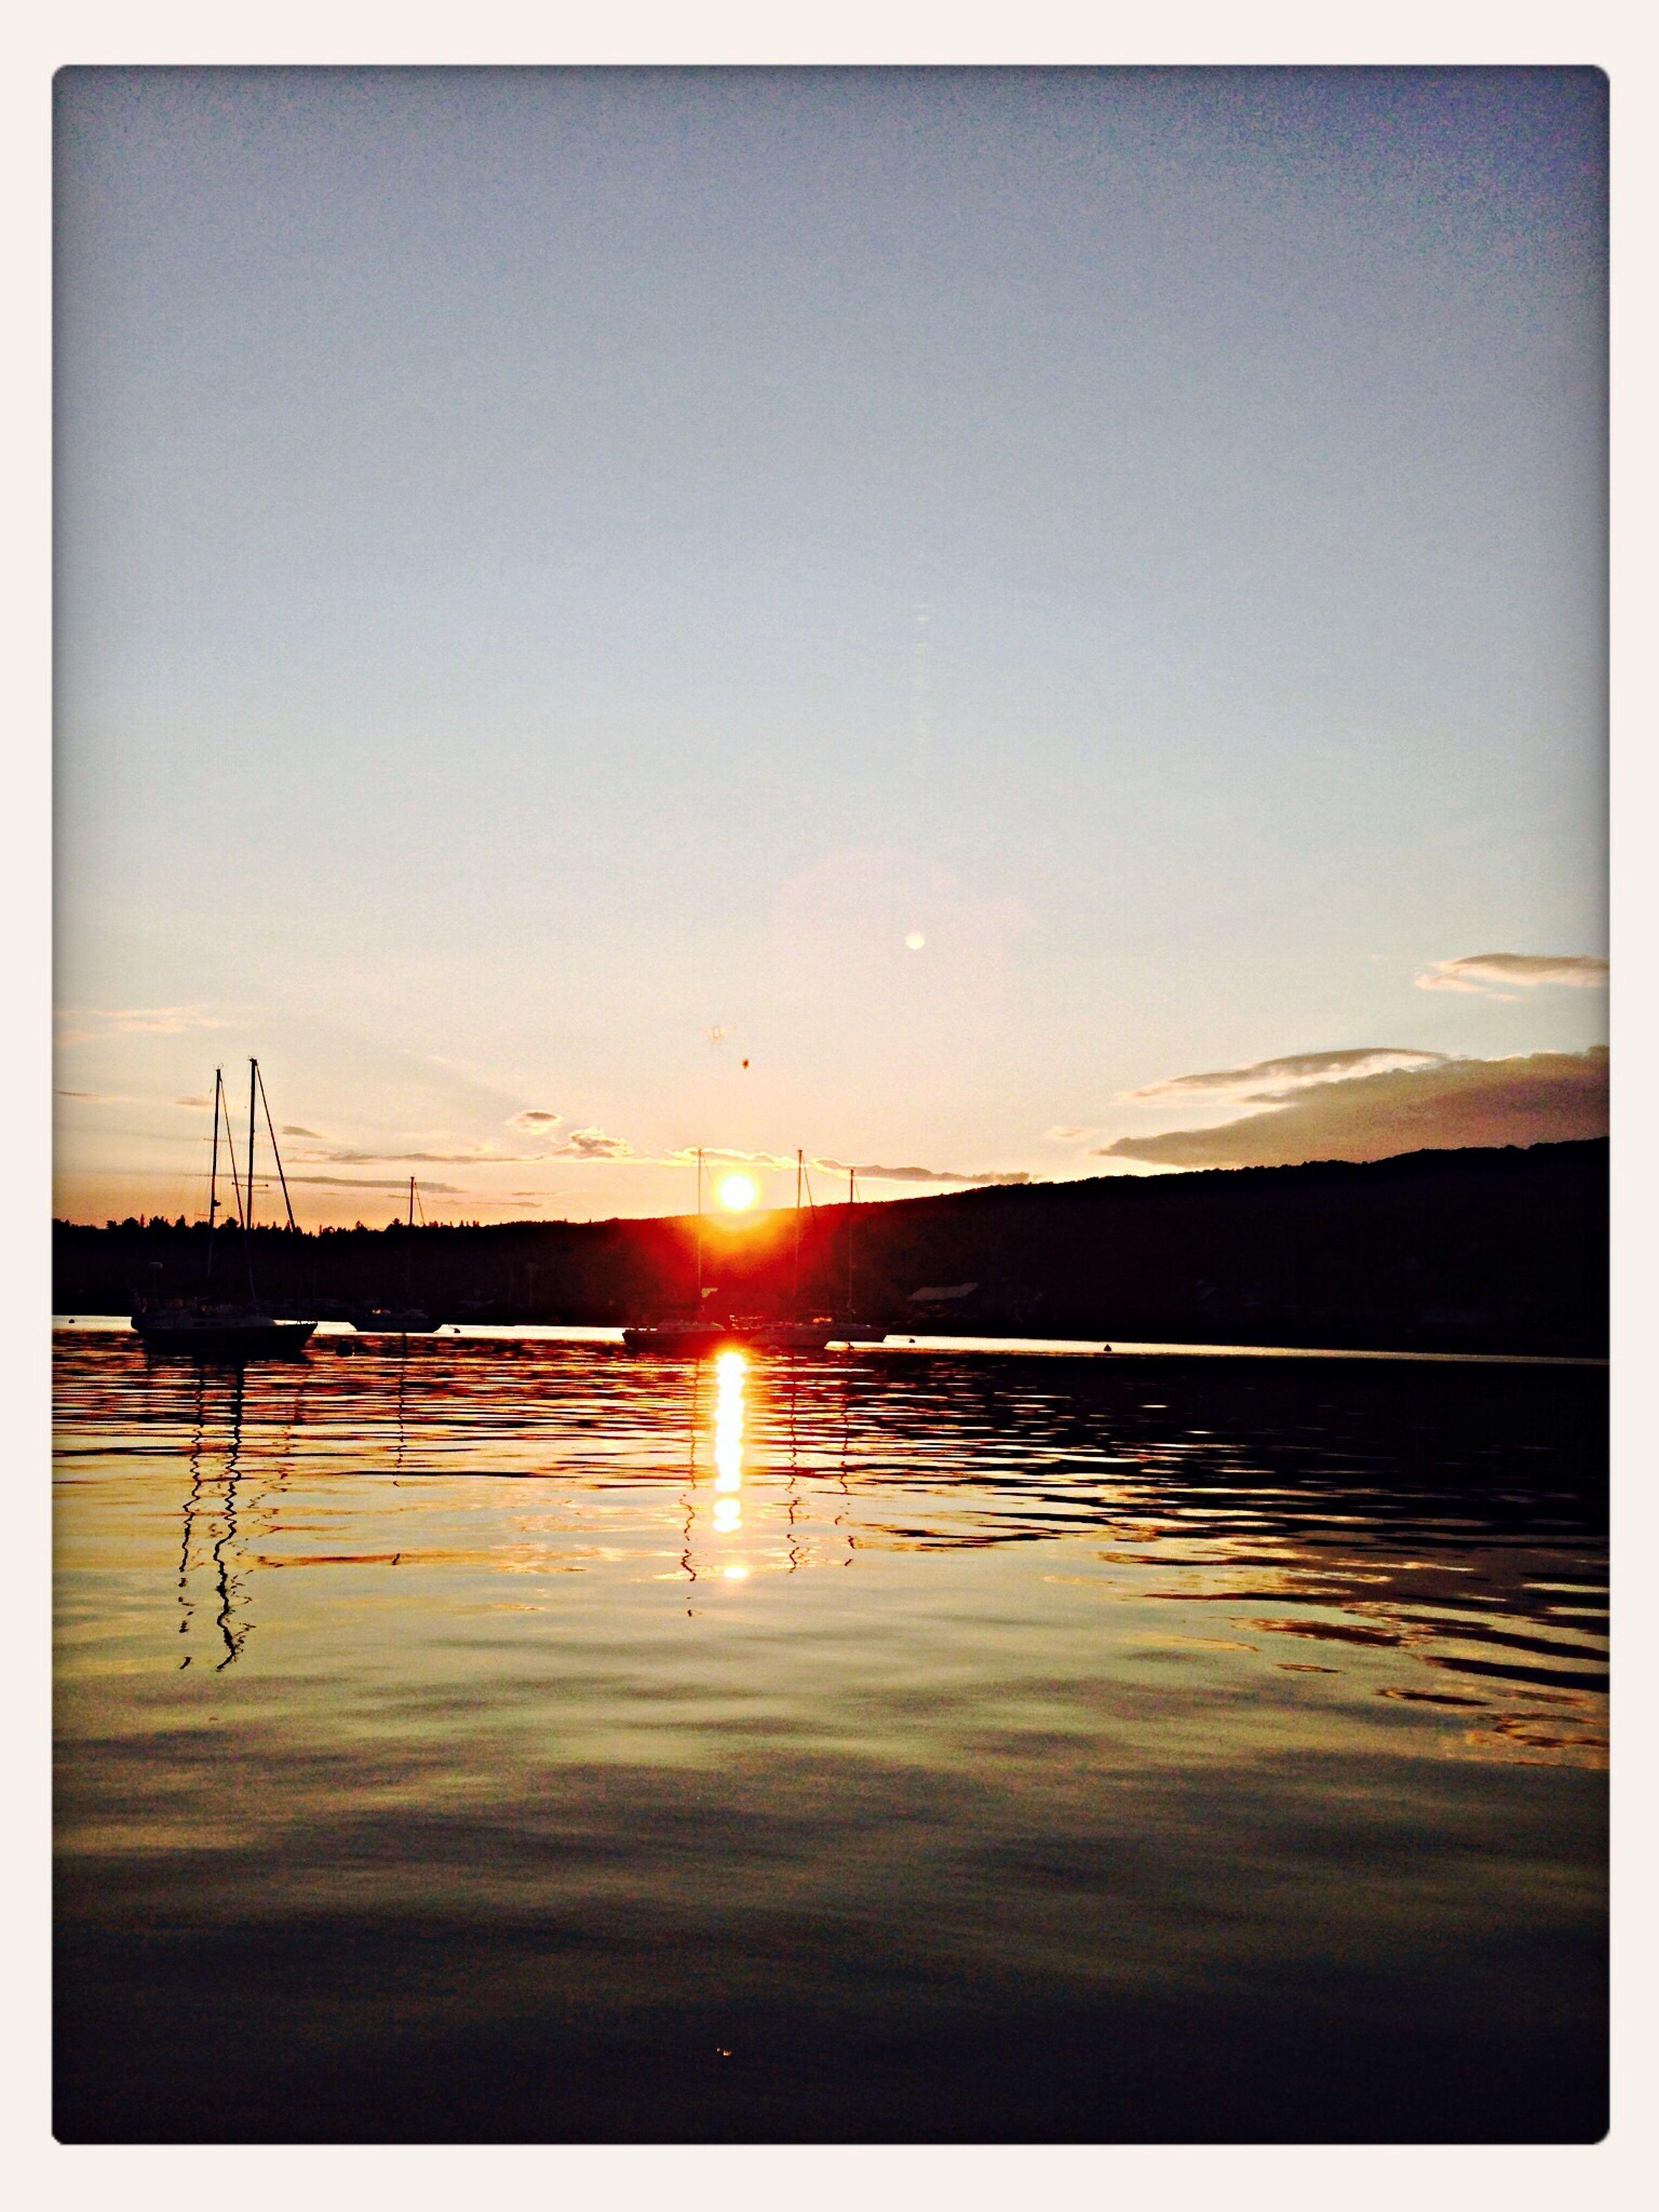 Sunset on the lake ☀️ Enjoying The Sun Sunshine Grand Marais